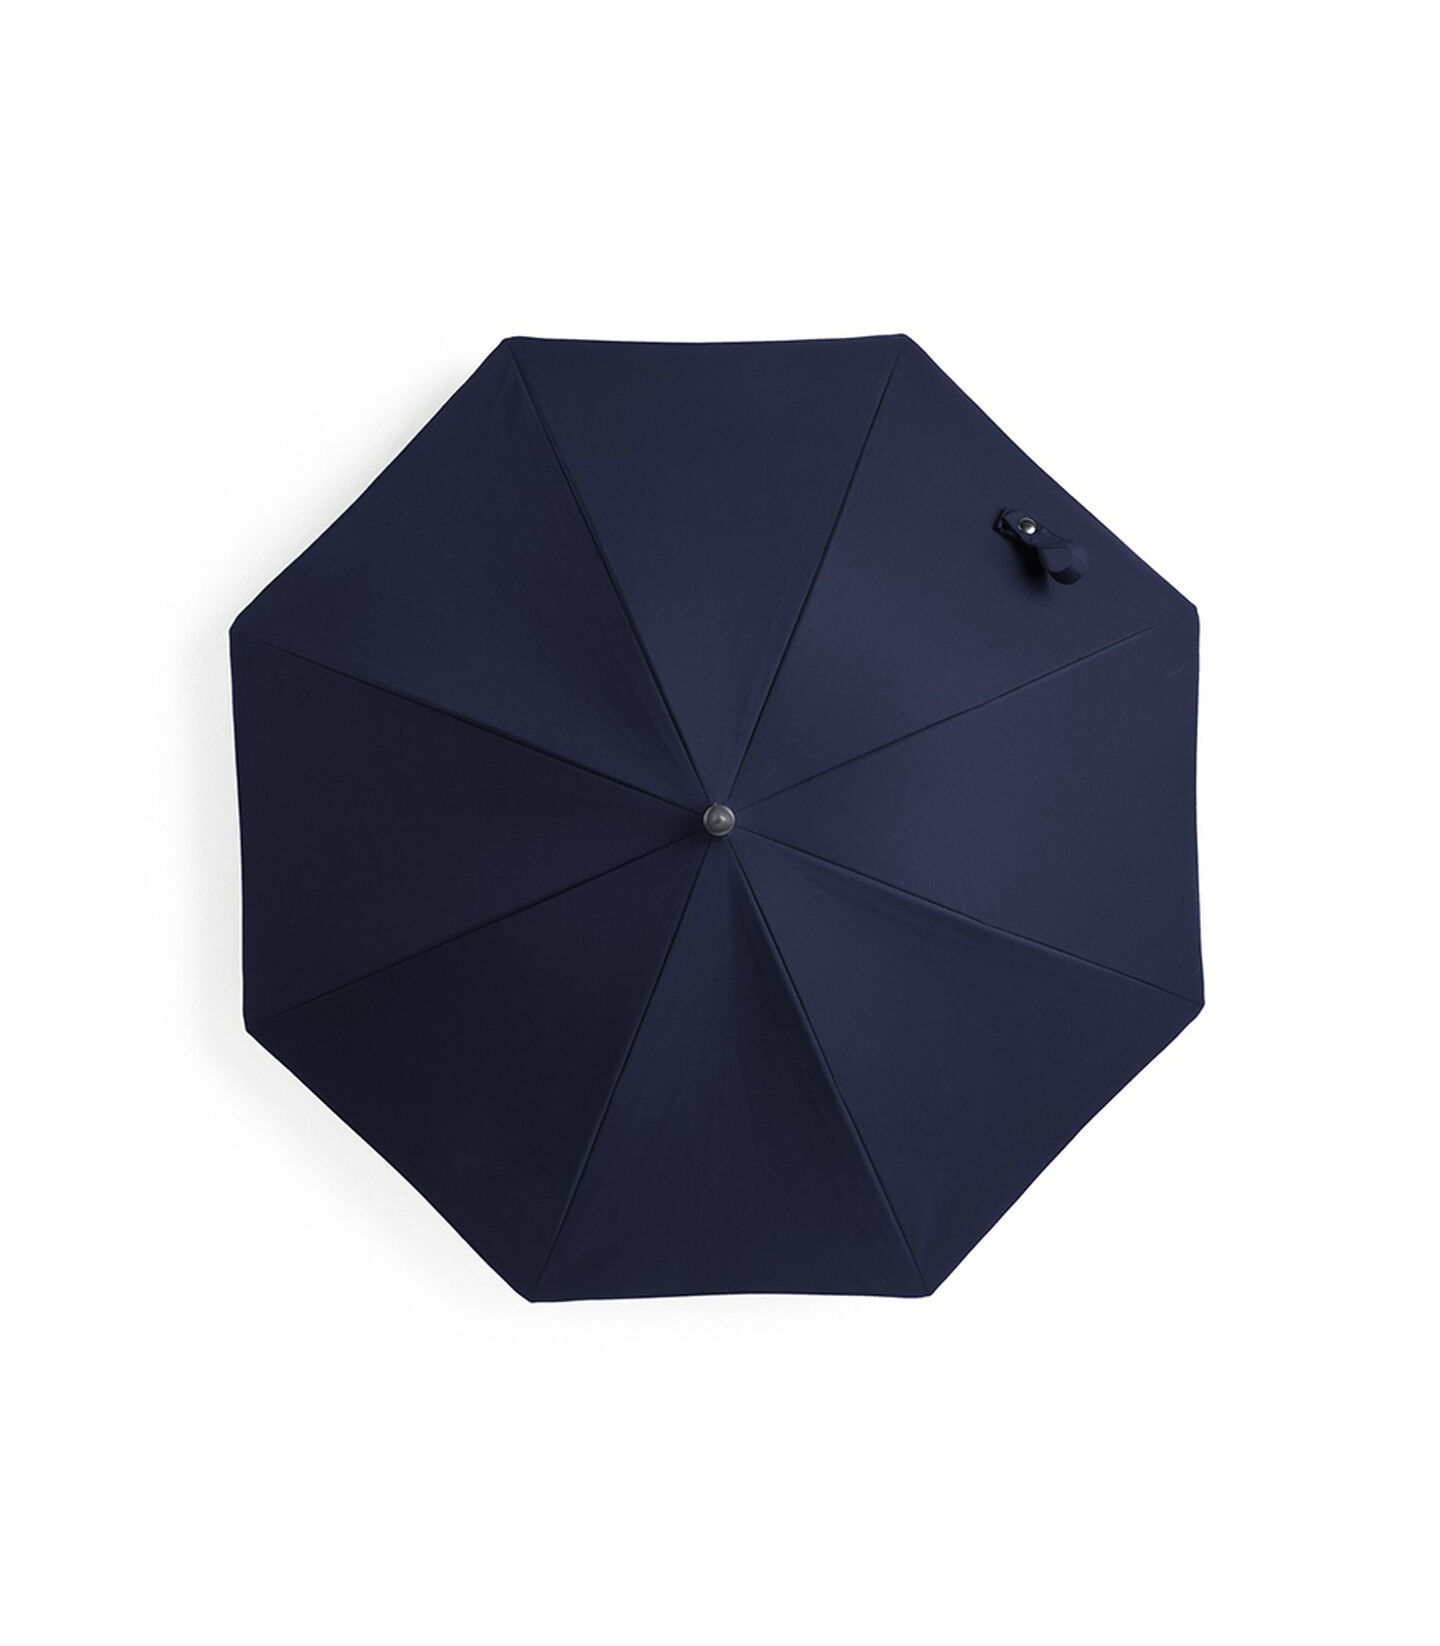 Stokke® Stroller Black Parasol Deep Blue, Blu Scuro, mainview view 2